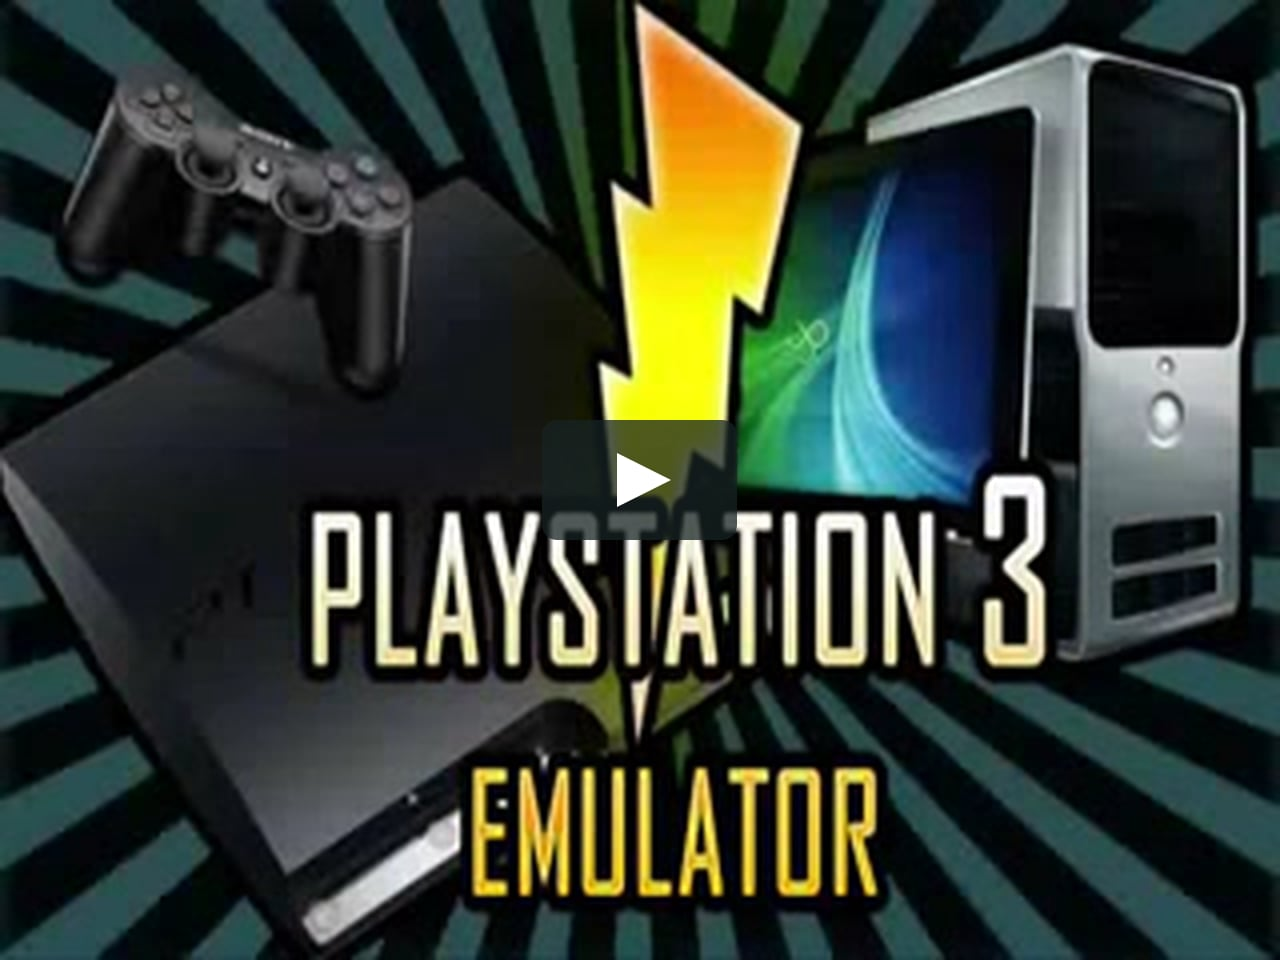 ps3 emulator freezes